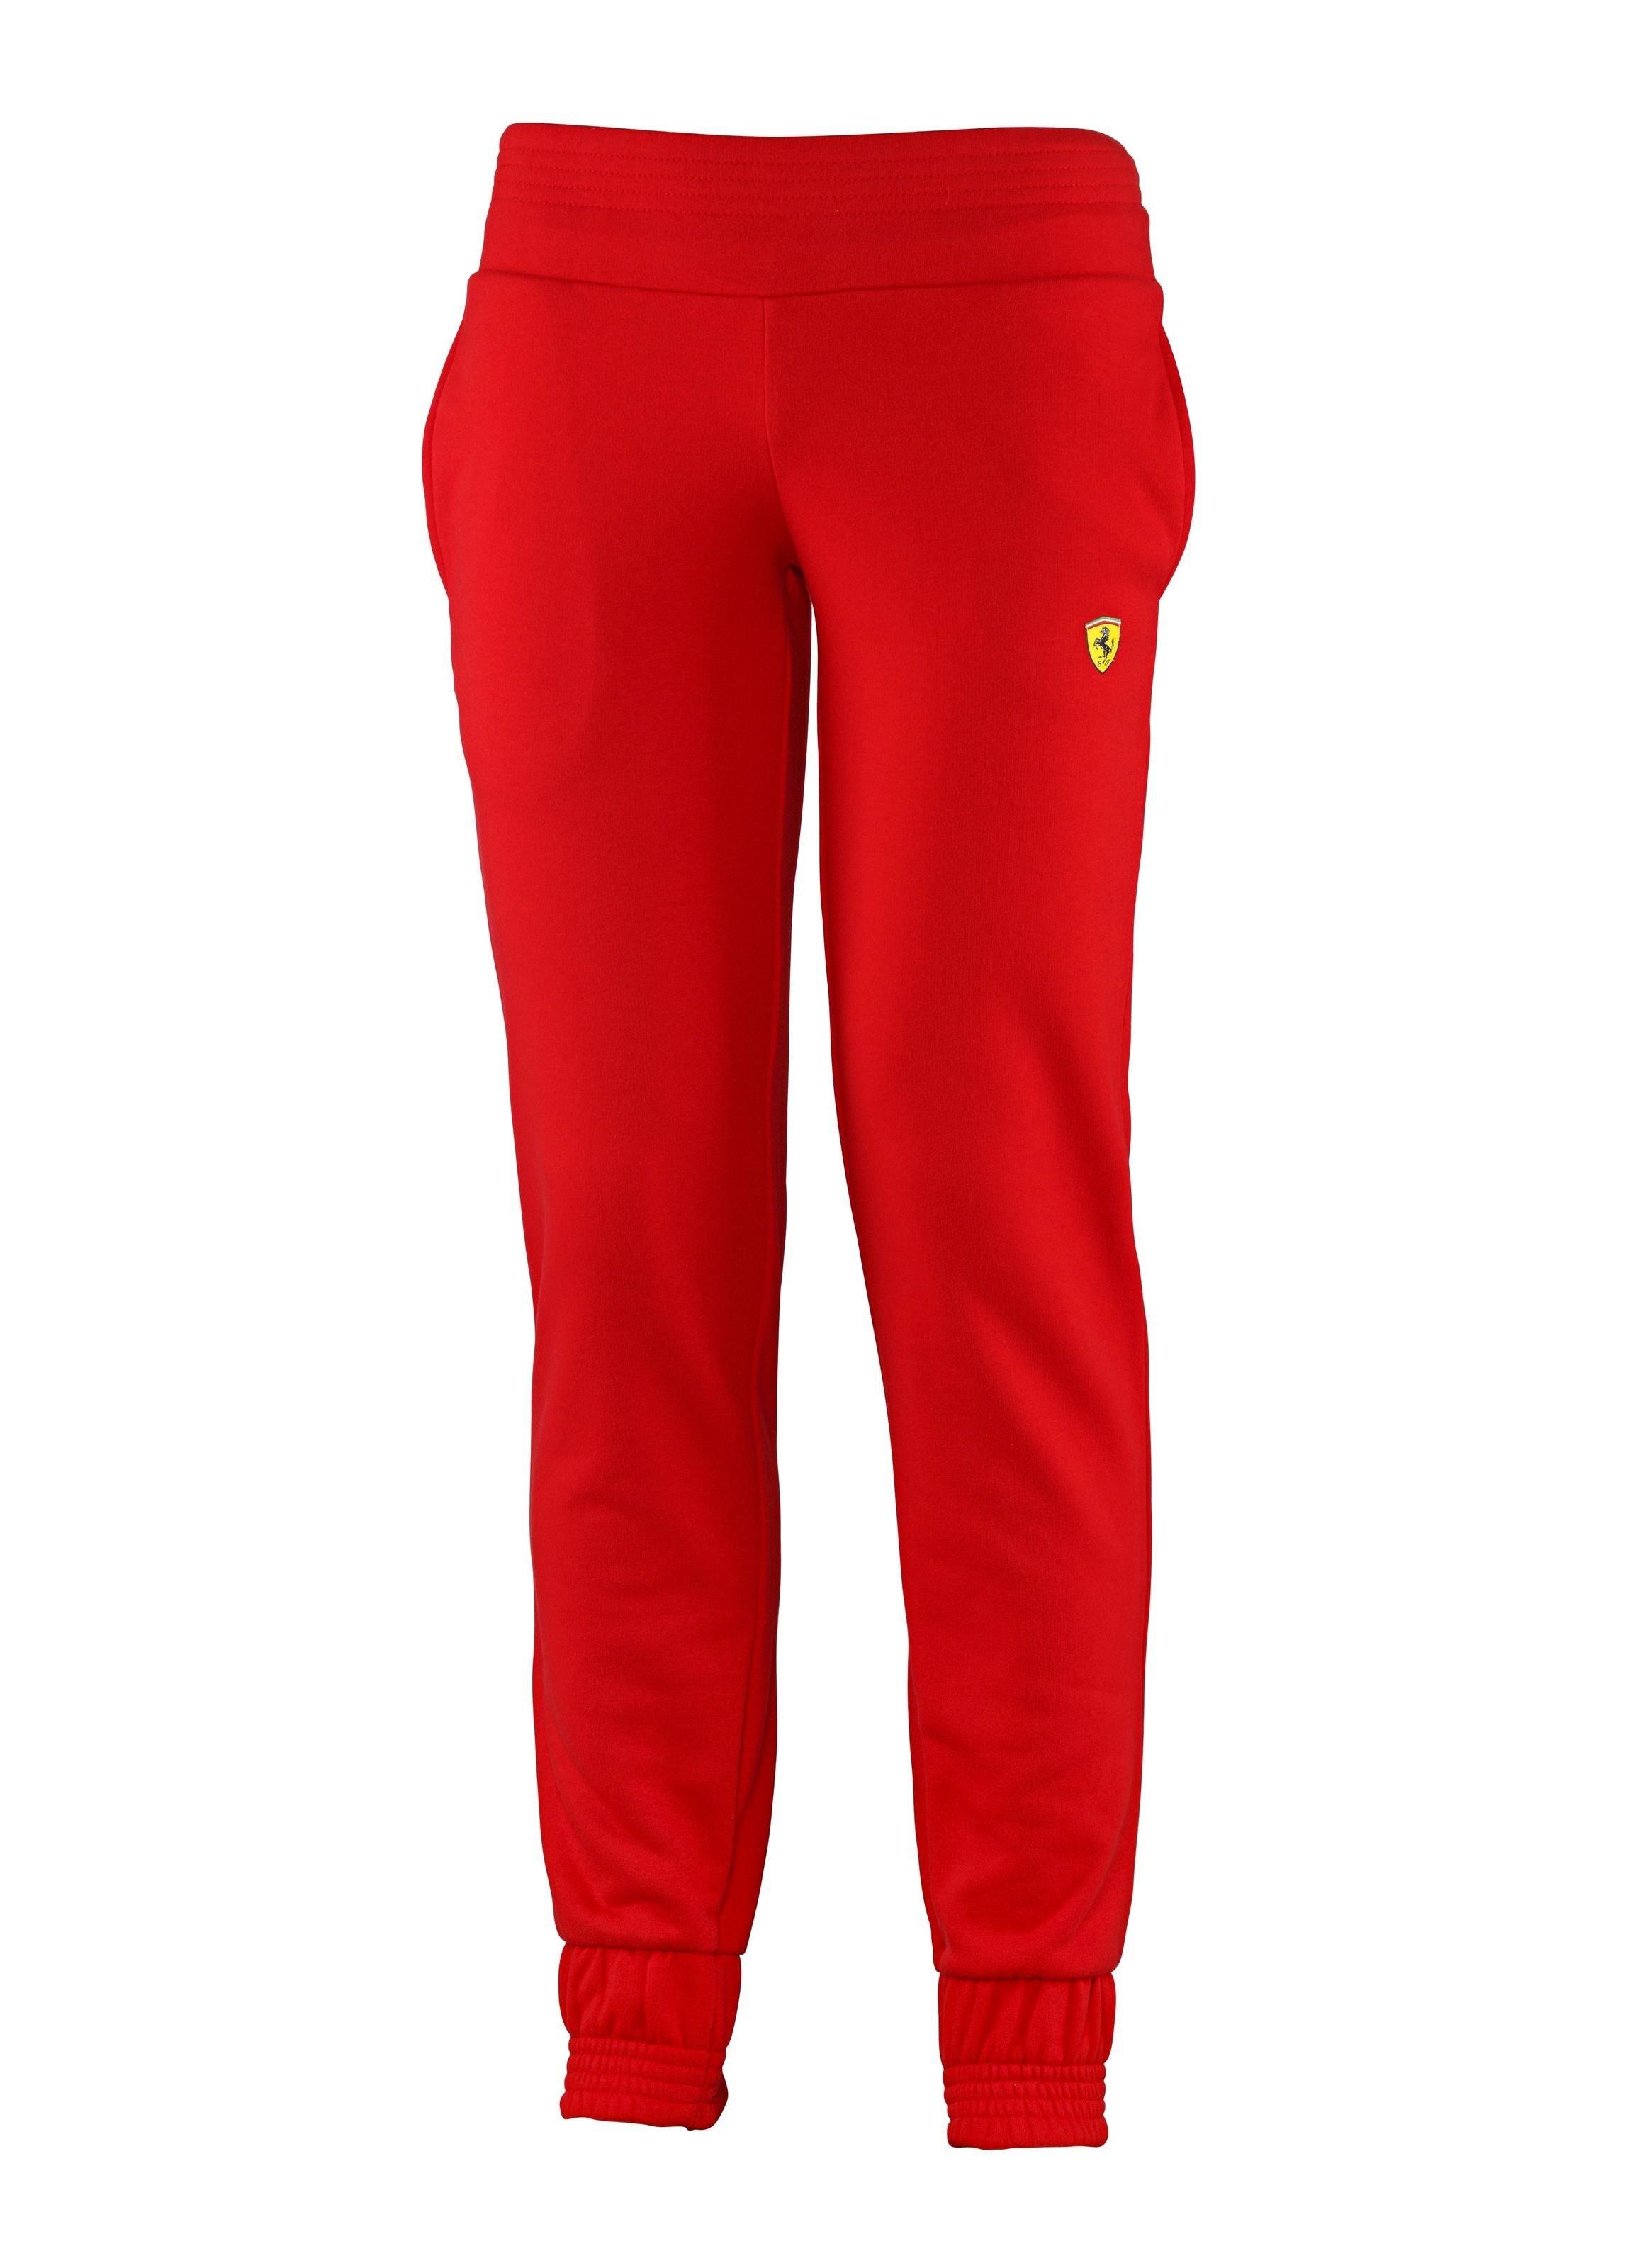 on pin ferrari clothes ferraristore available now com suit kids s pile kid store